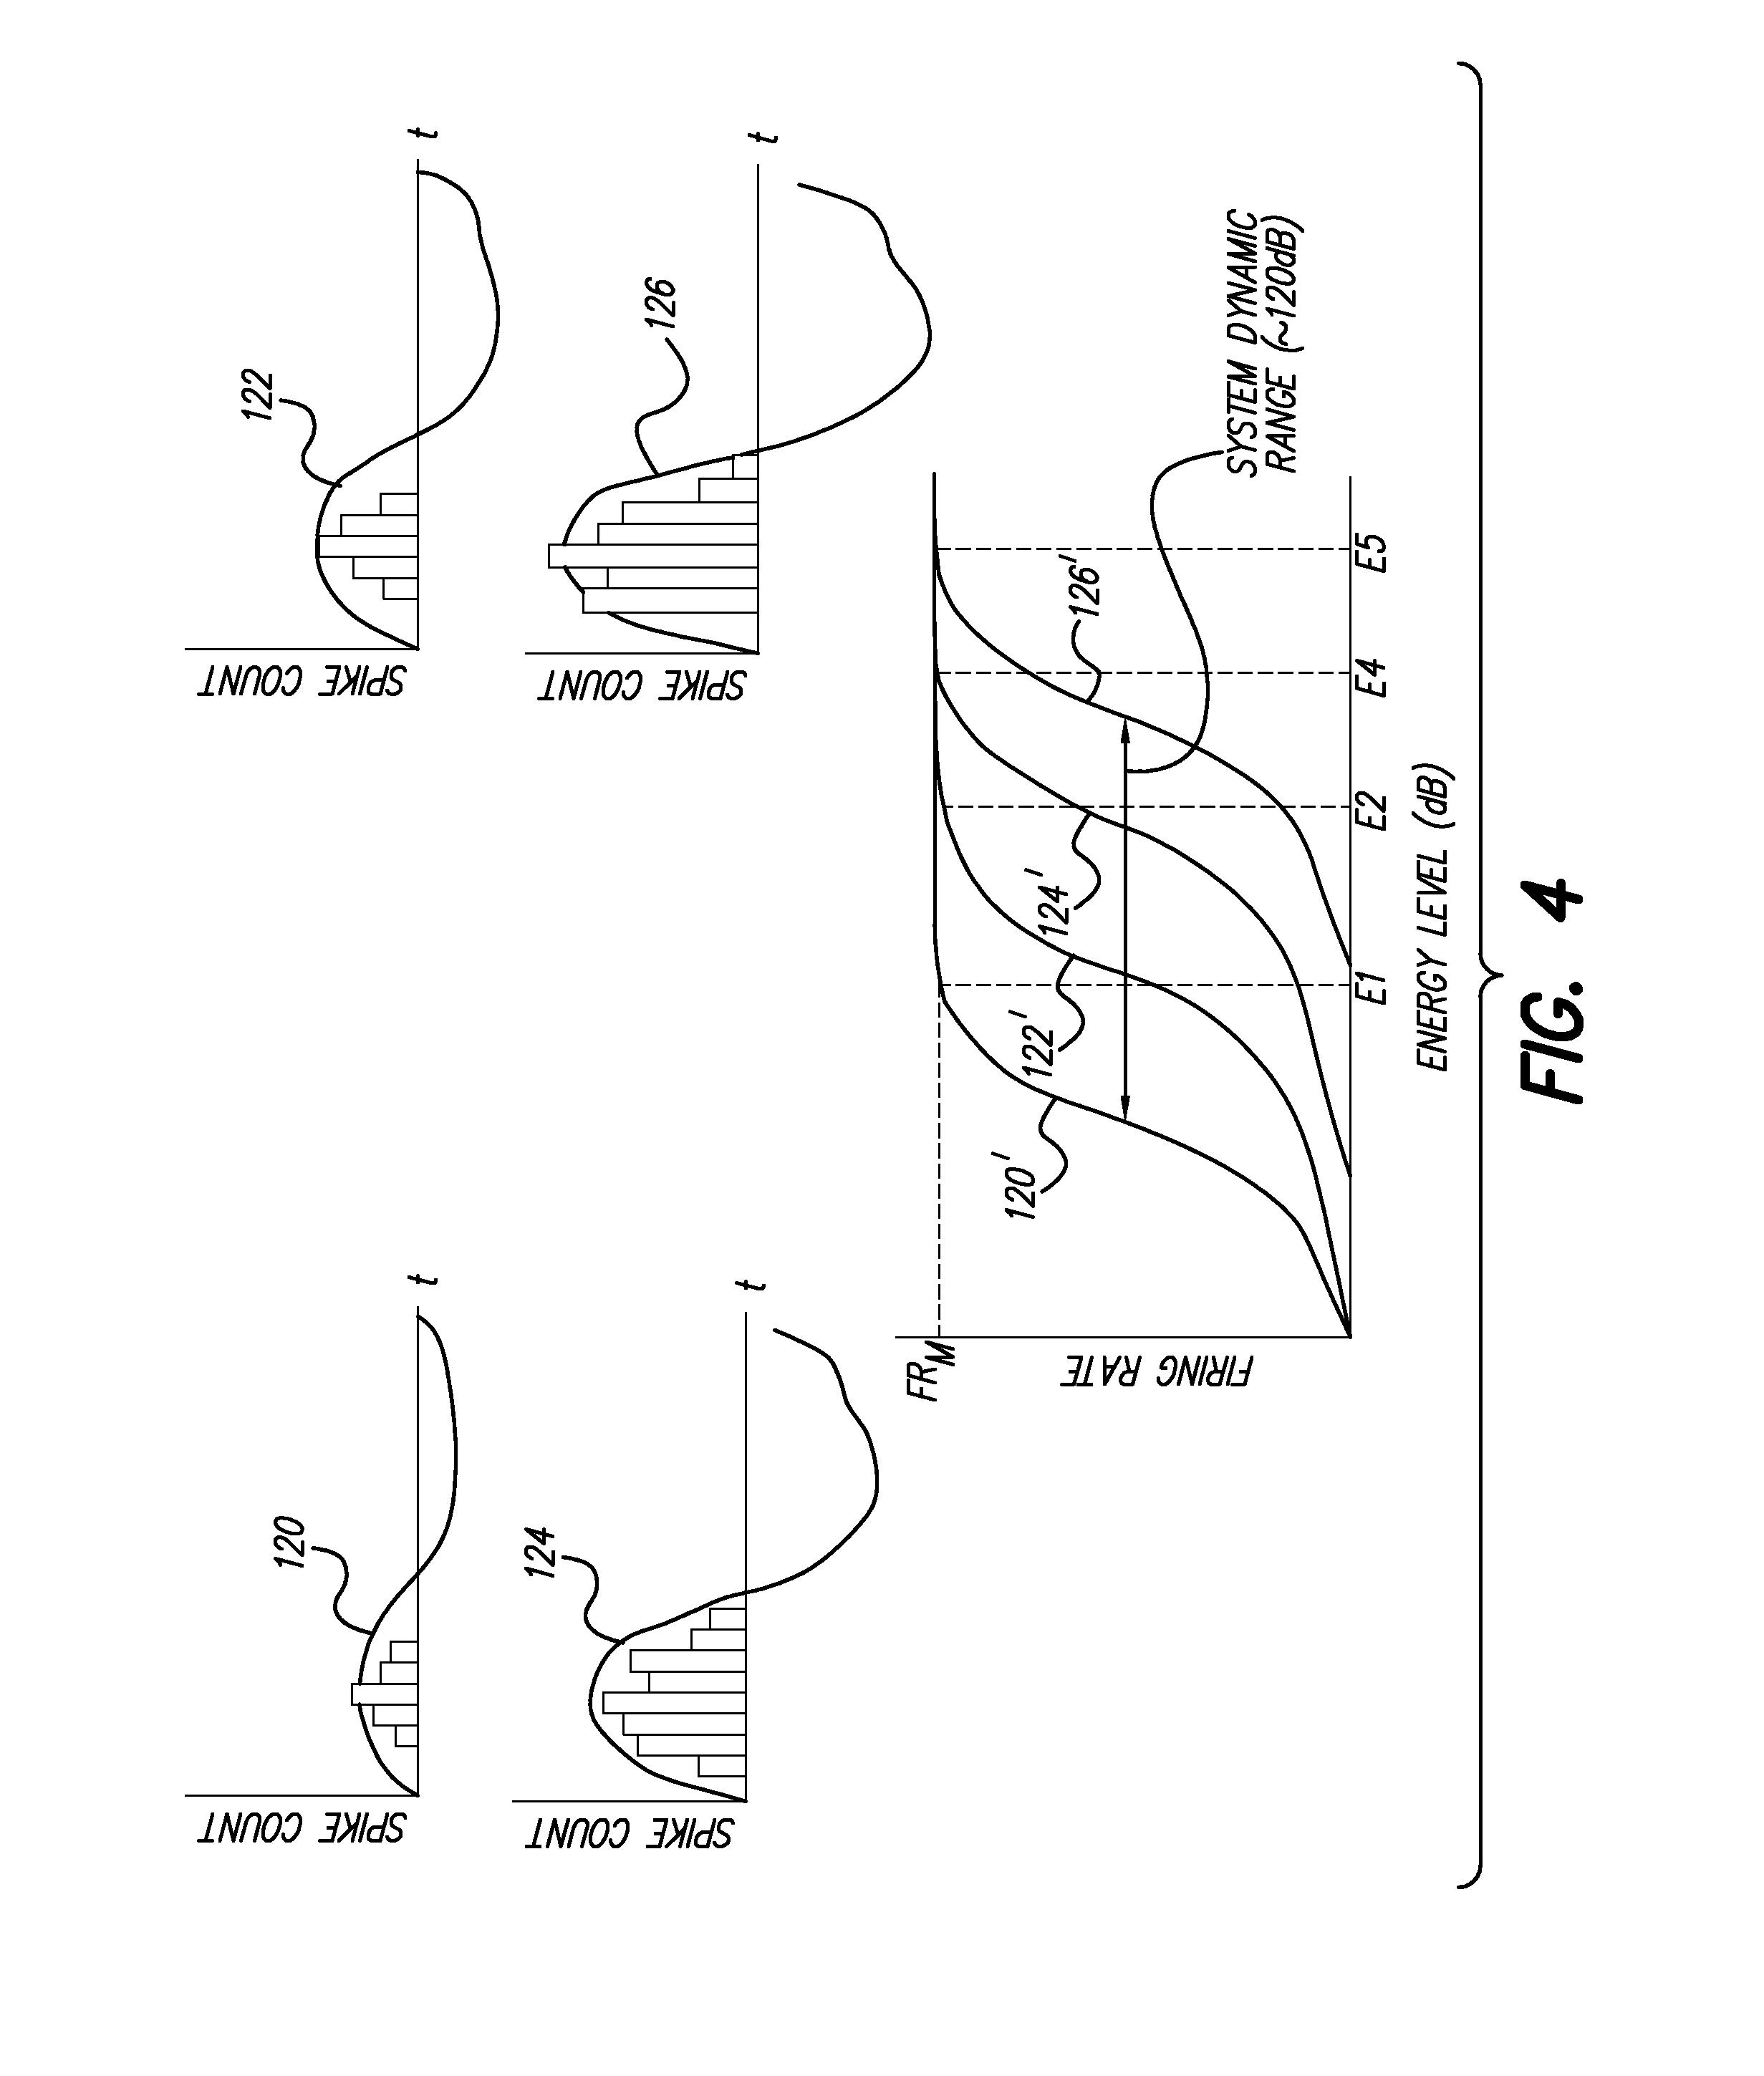 patente us20070239226